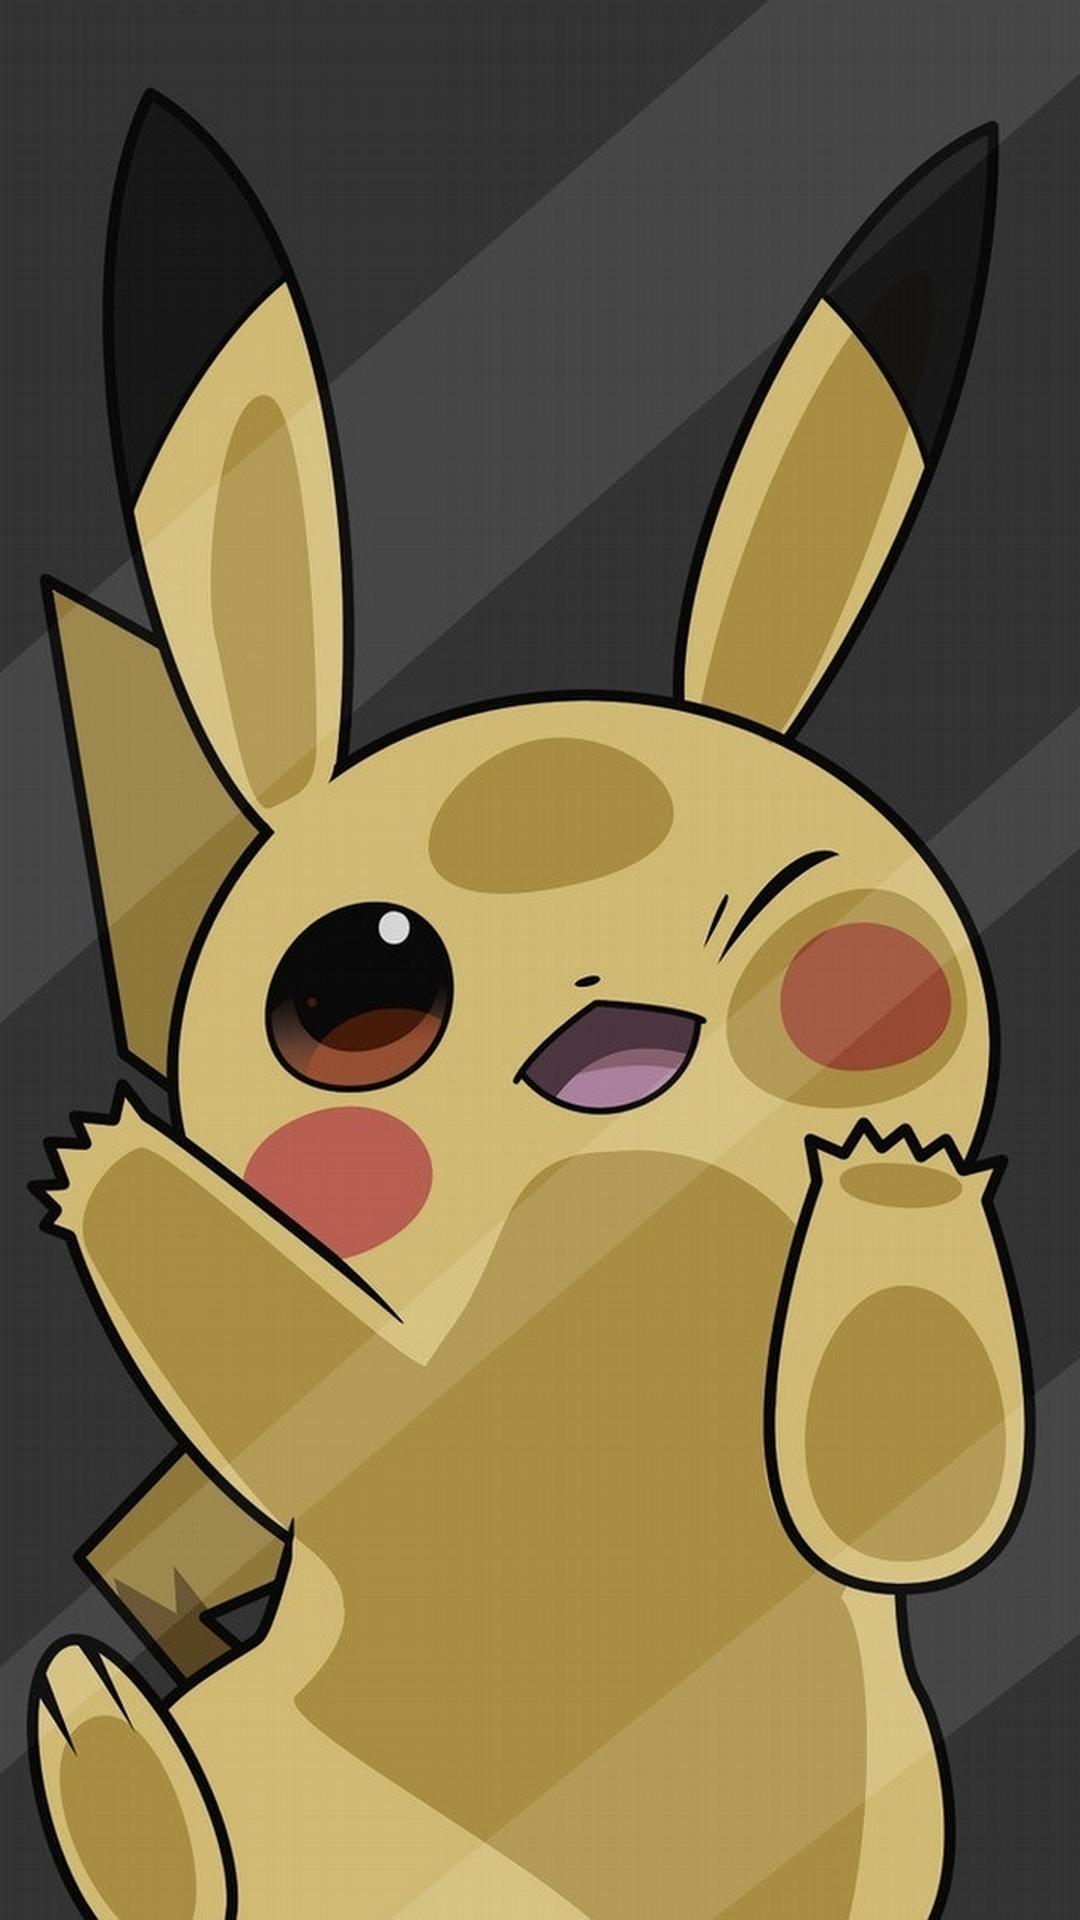 Free Download Pikachu Iphone 6 Plus Wallpaper 1080x1920 1080x1920